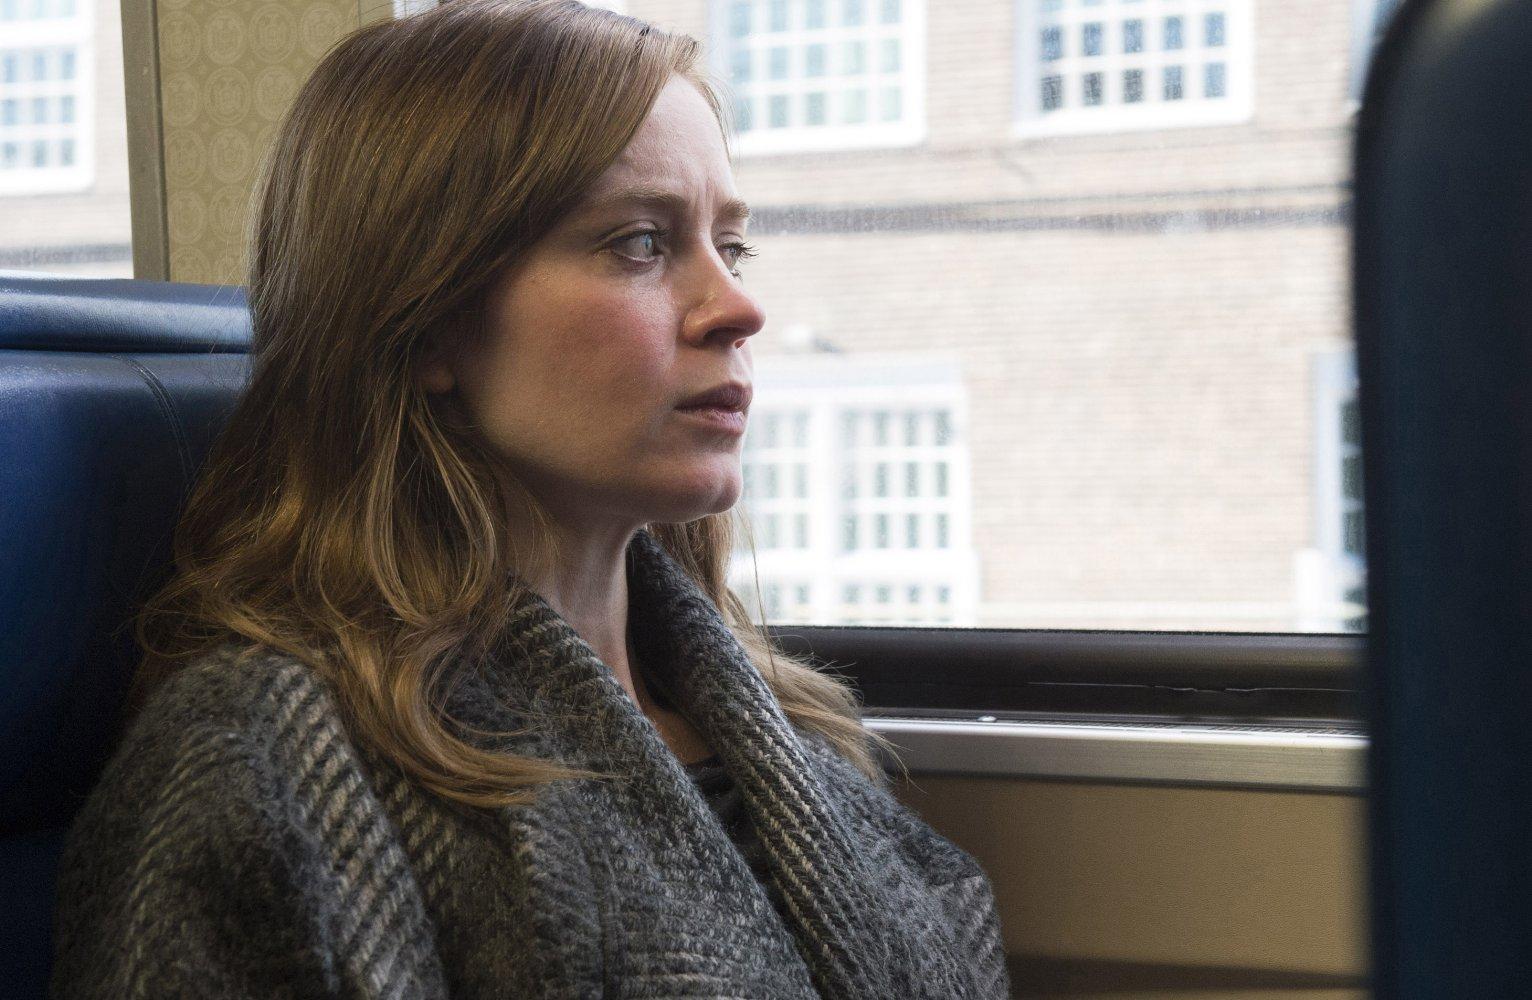 Girl-on-the-train.jpg